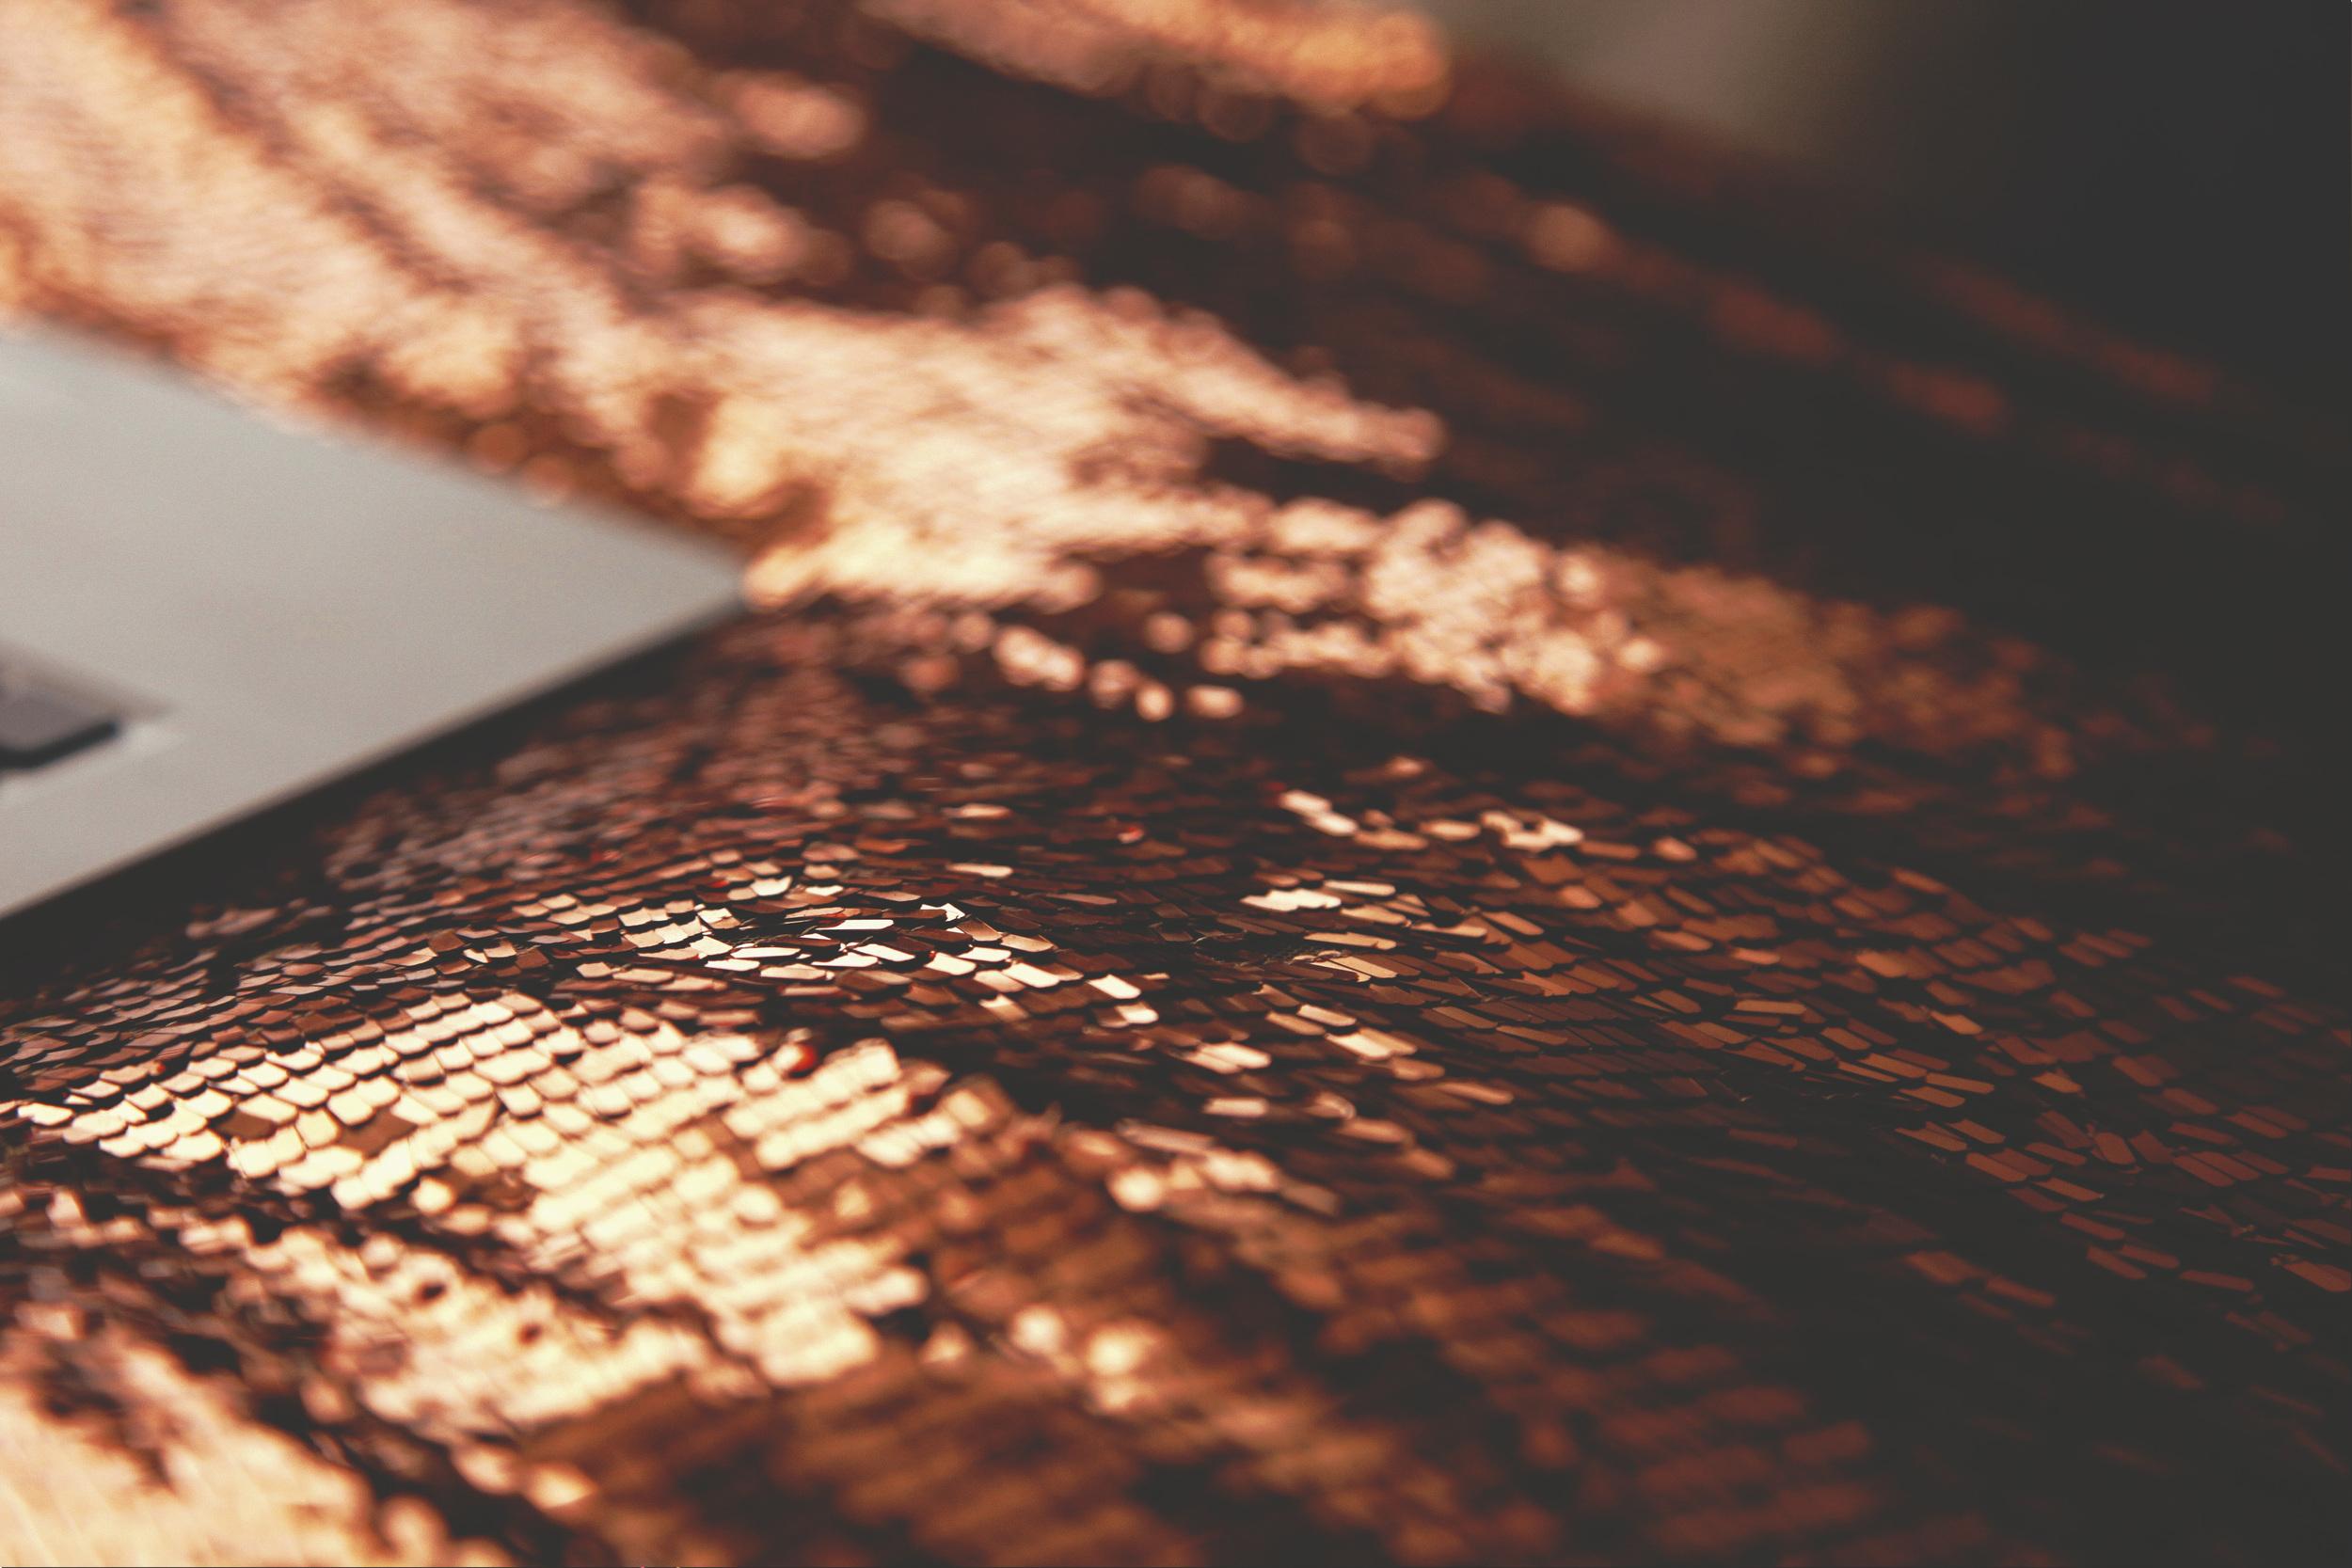 Diana Rogo bed cover 4.jpg